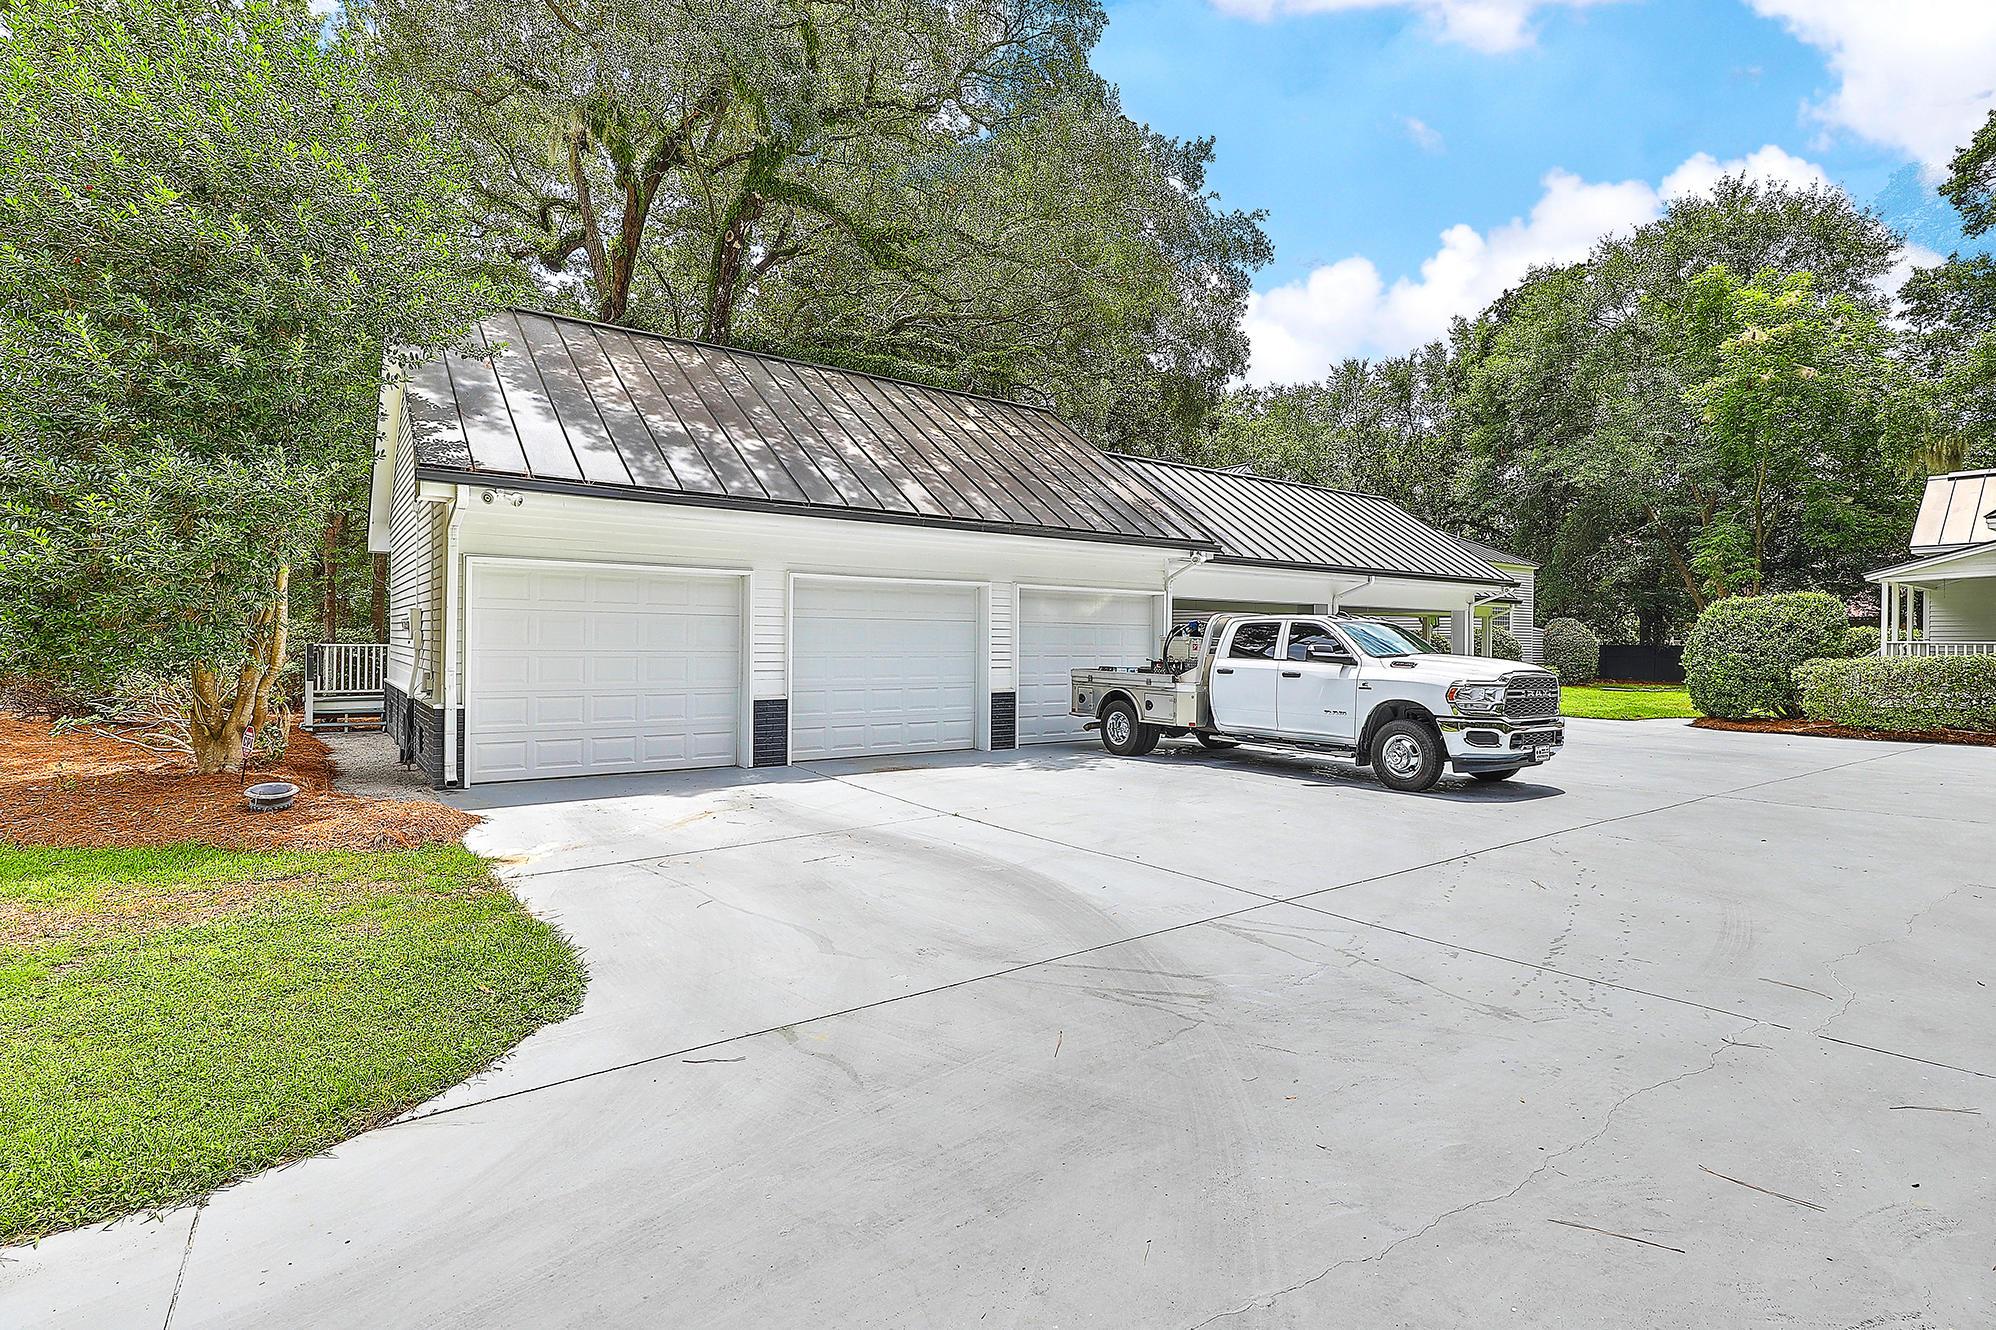 Summerville Homes For Sale - 102 Hickory, Summerville, SC - 86